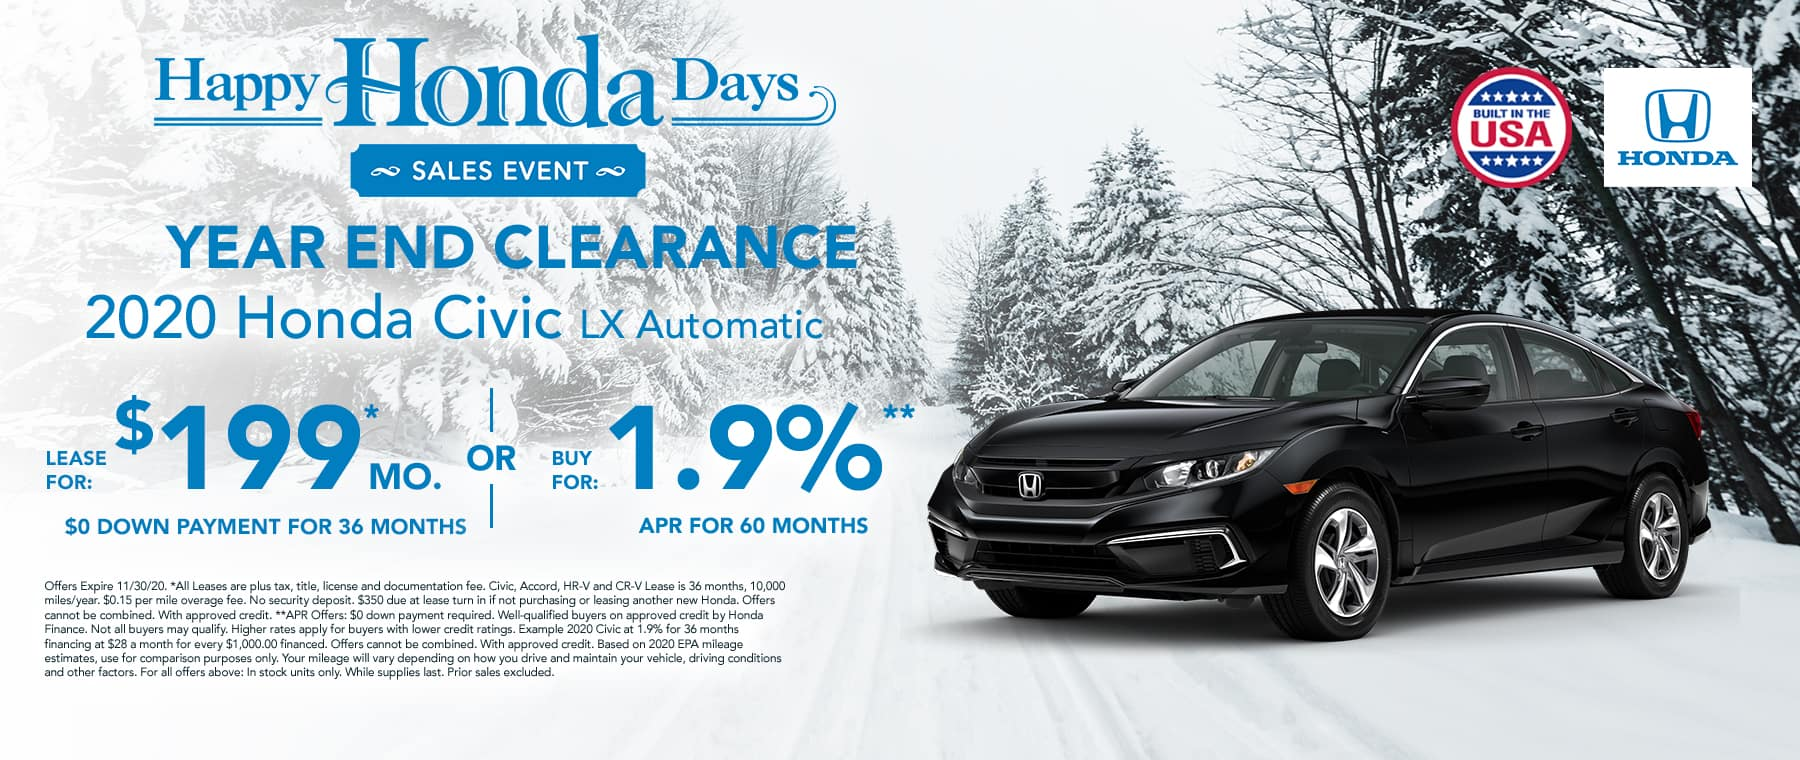 New Honda Civic for $199 per month